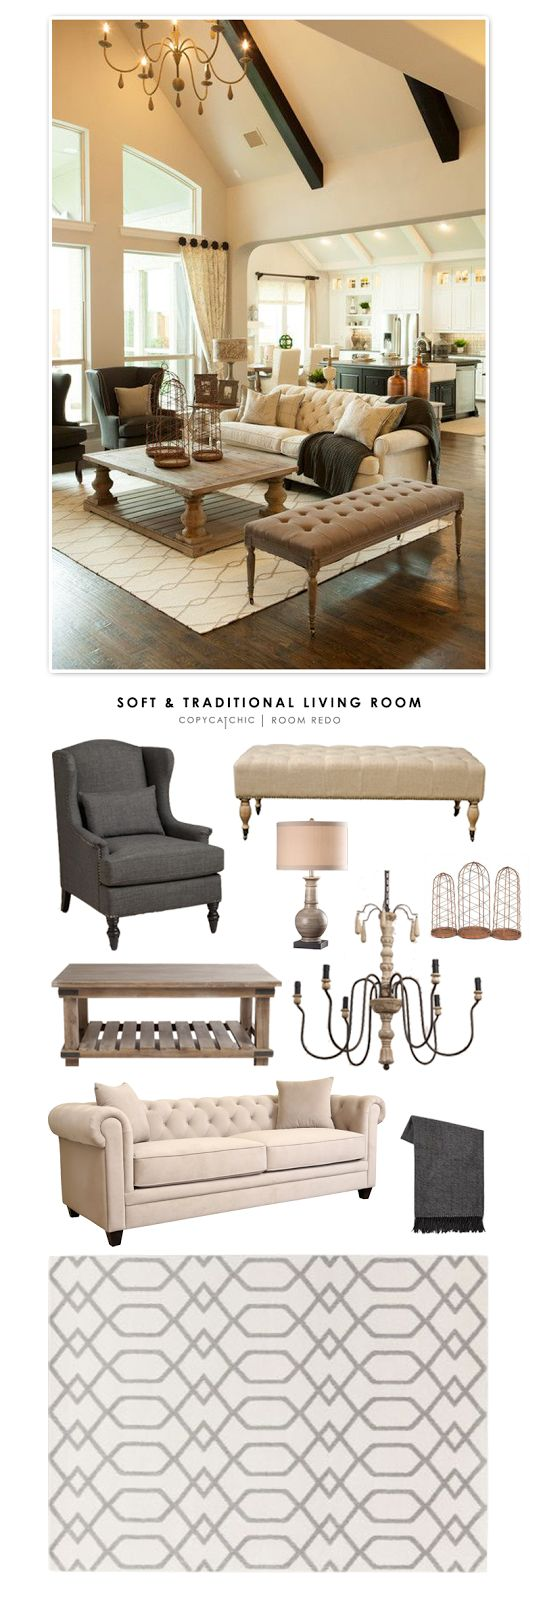 Copy Cat Chic Room Redo | Soft & Traditional Living Room | | Copy Cat Chic | chic for cheap | Bloglovin' | www.bocadolobo.com/ #livingroomideas #livingroomdecor